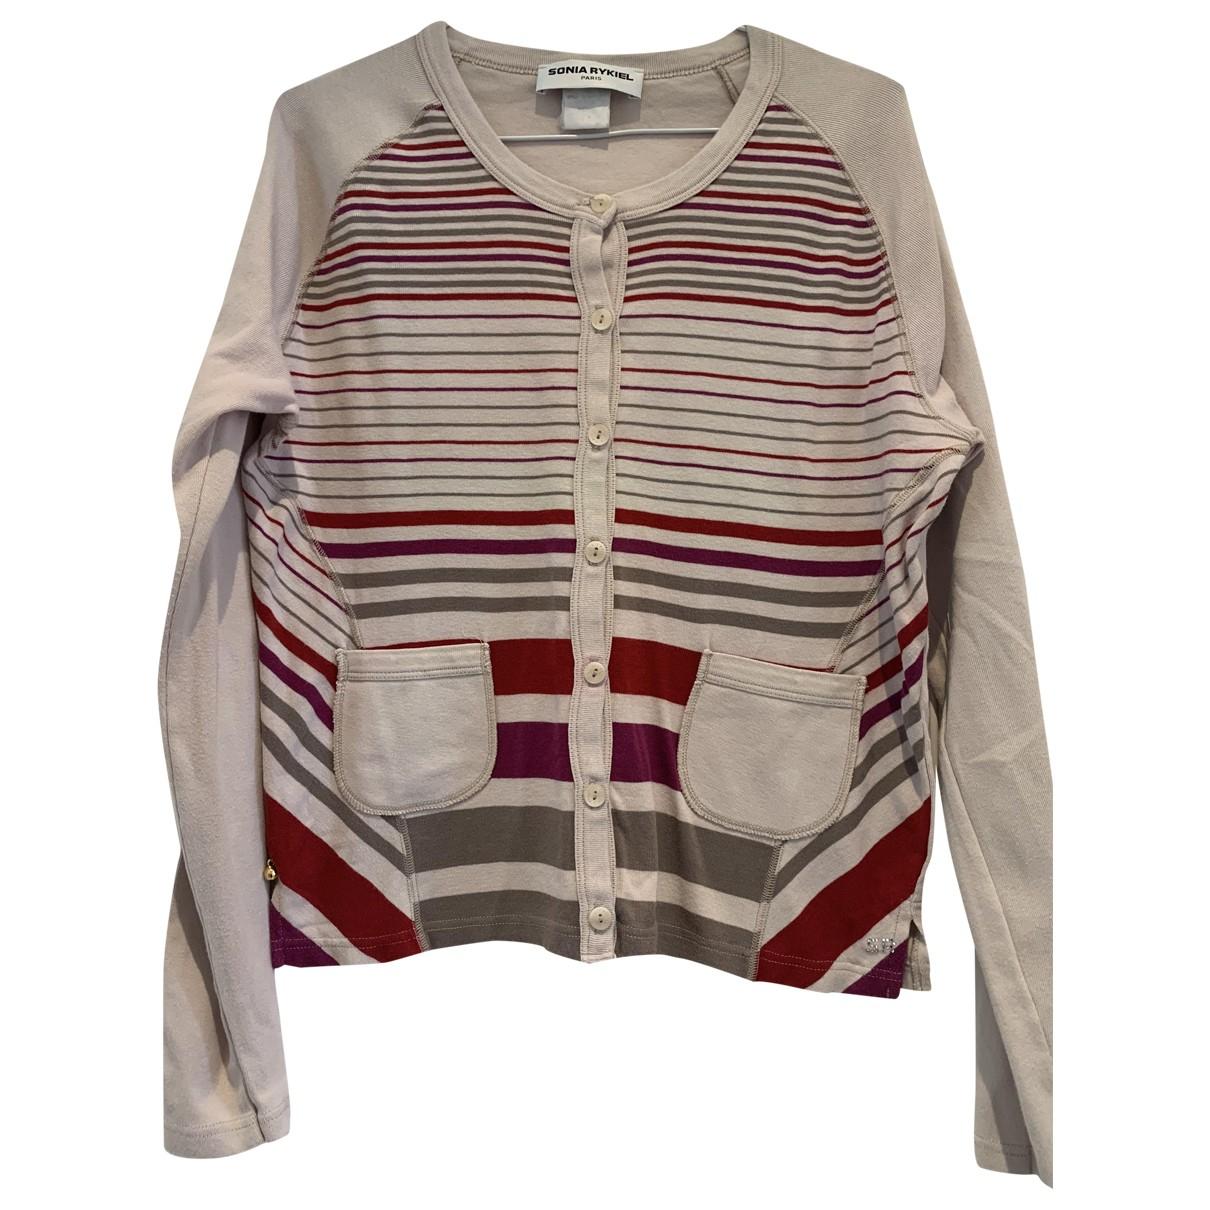 Sonia Rykiel - Pull   pour femme en coton - beige